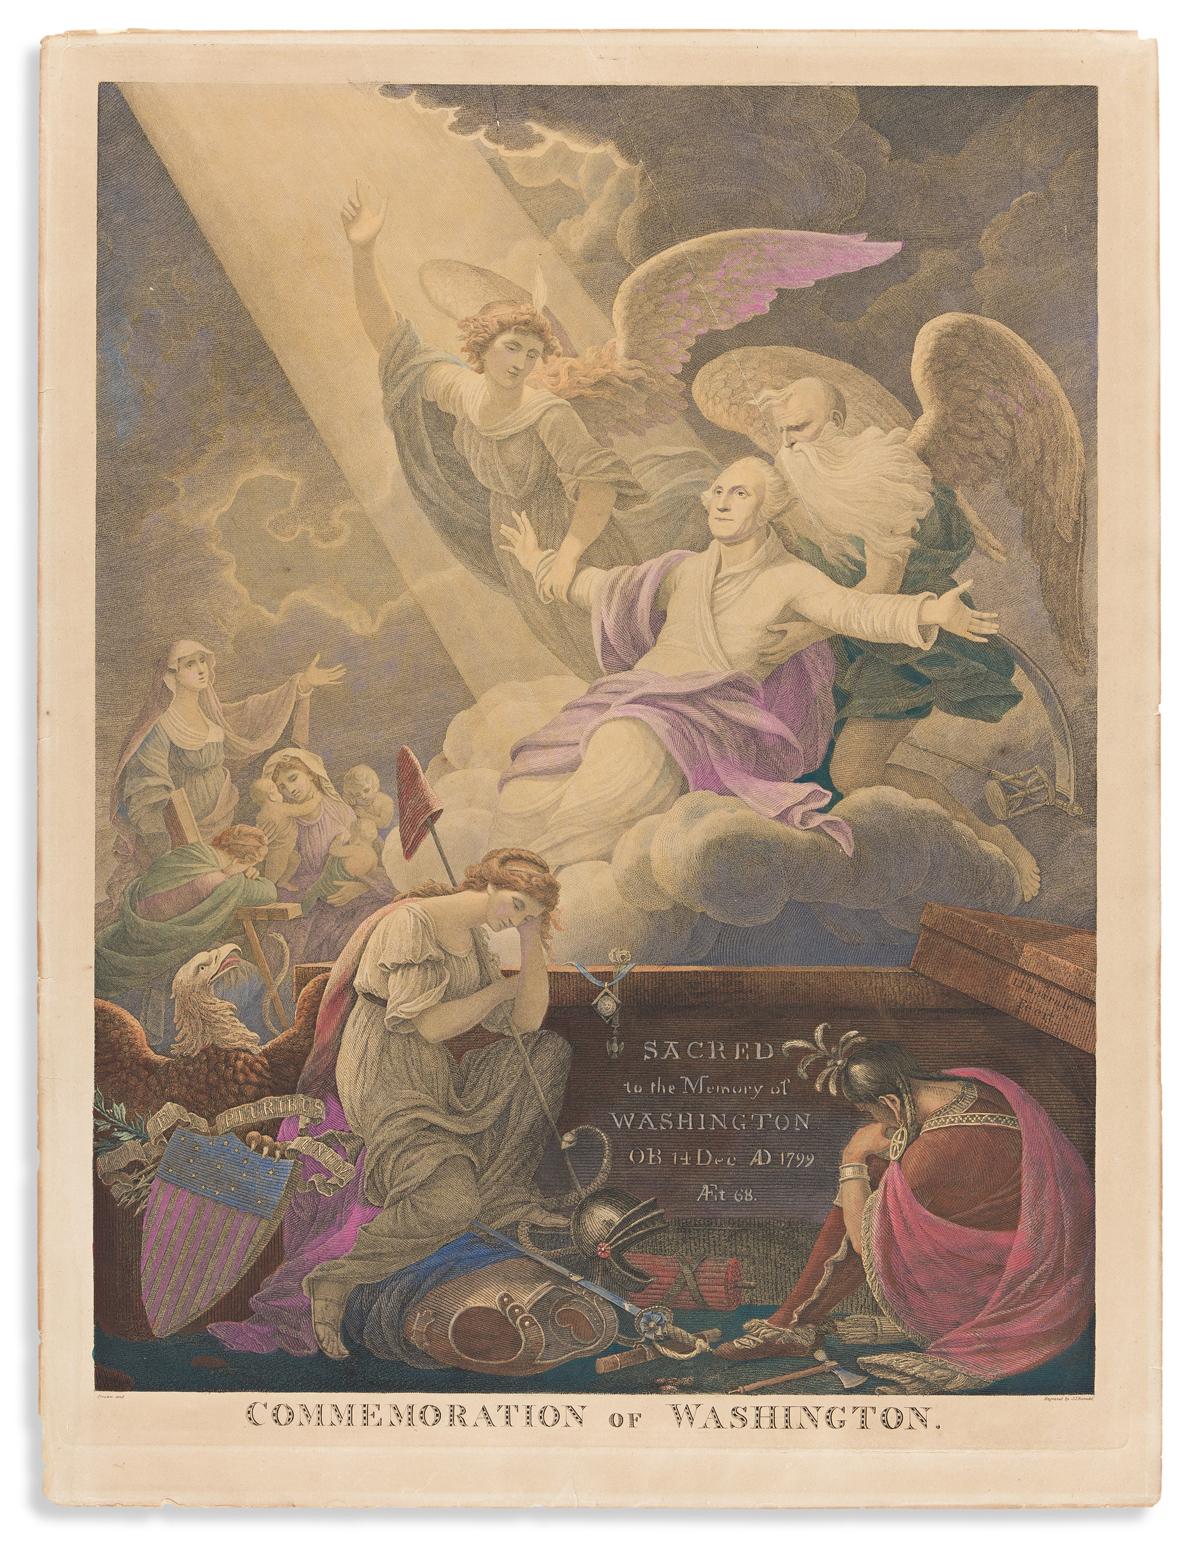 (WASHINGTON.) John James Barralet, artist and engraver. Commemoration of Washington.